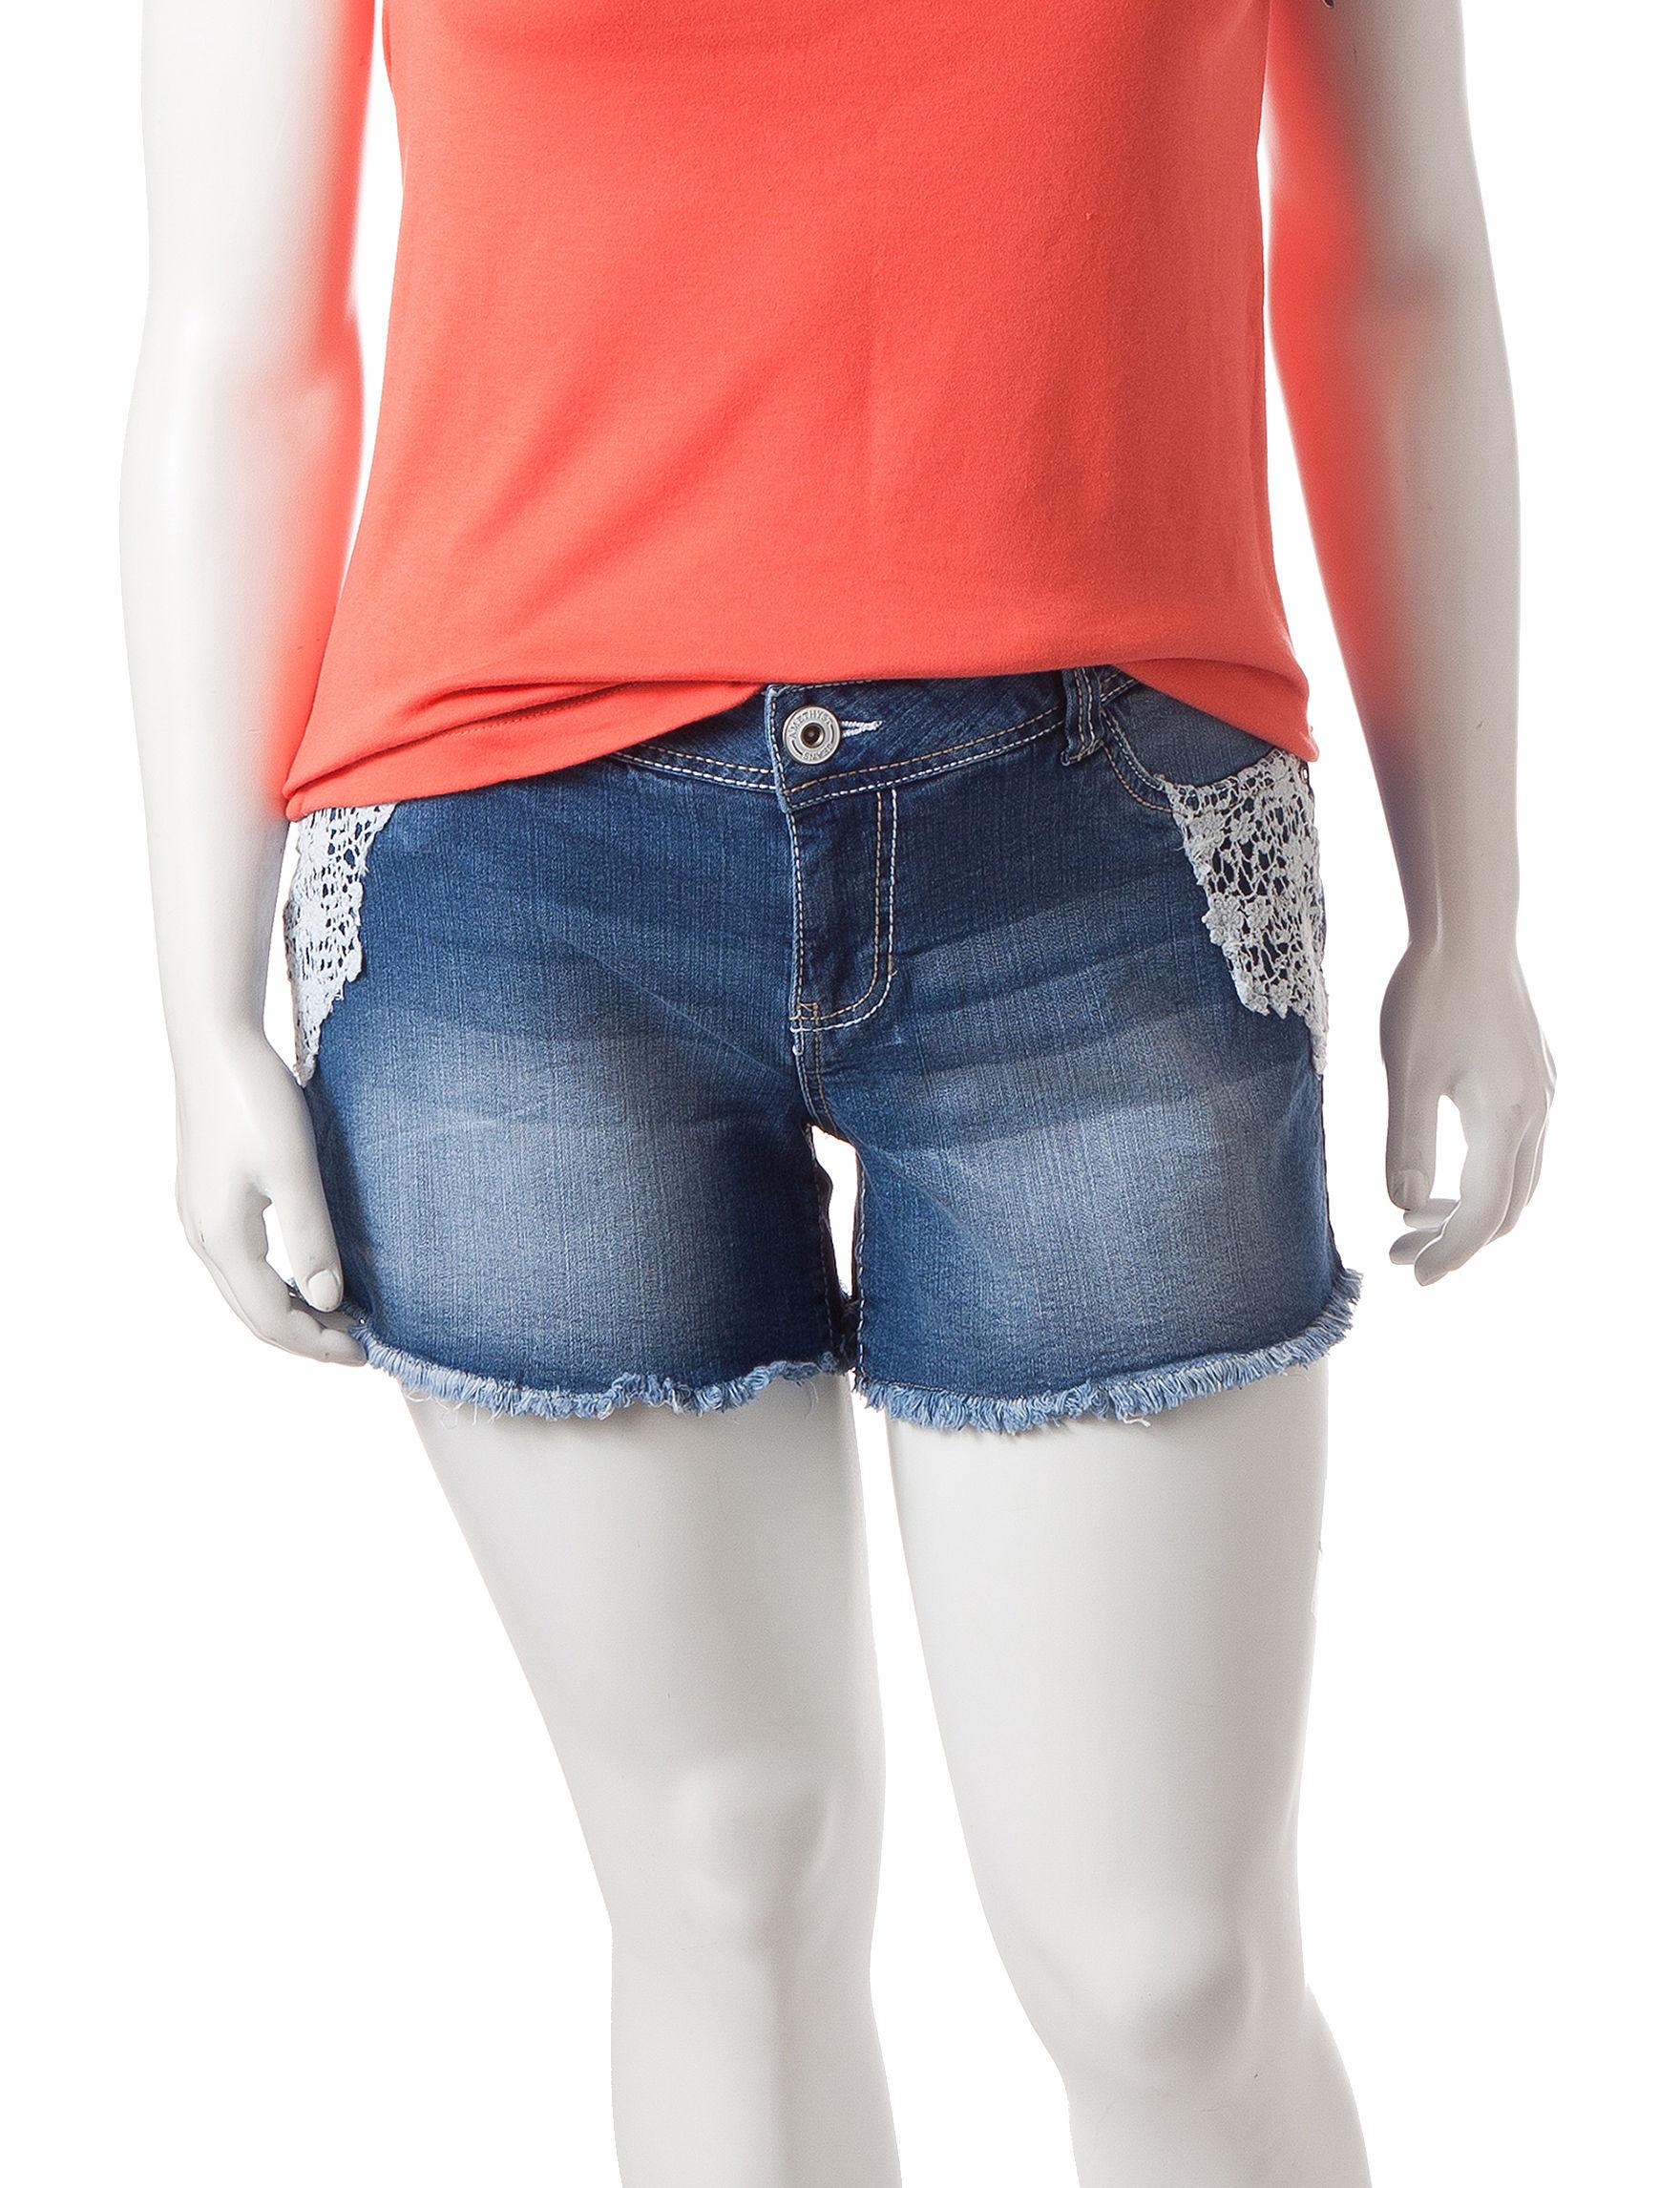 Amethyst Dark Blue Denim Shorts